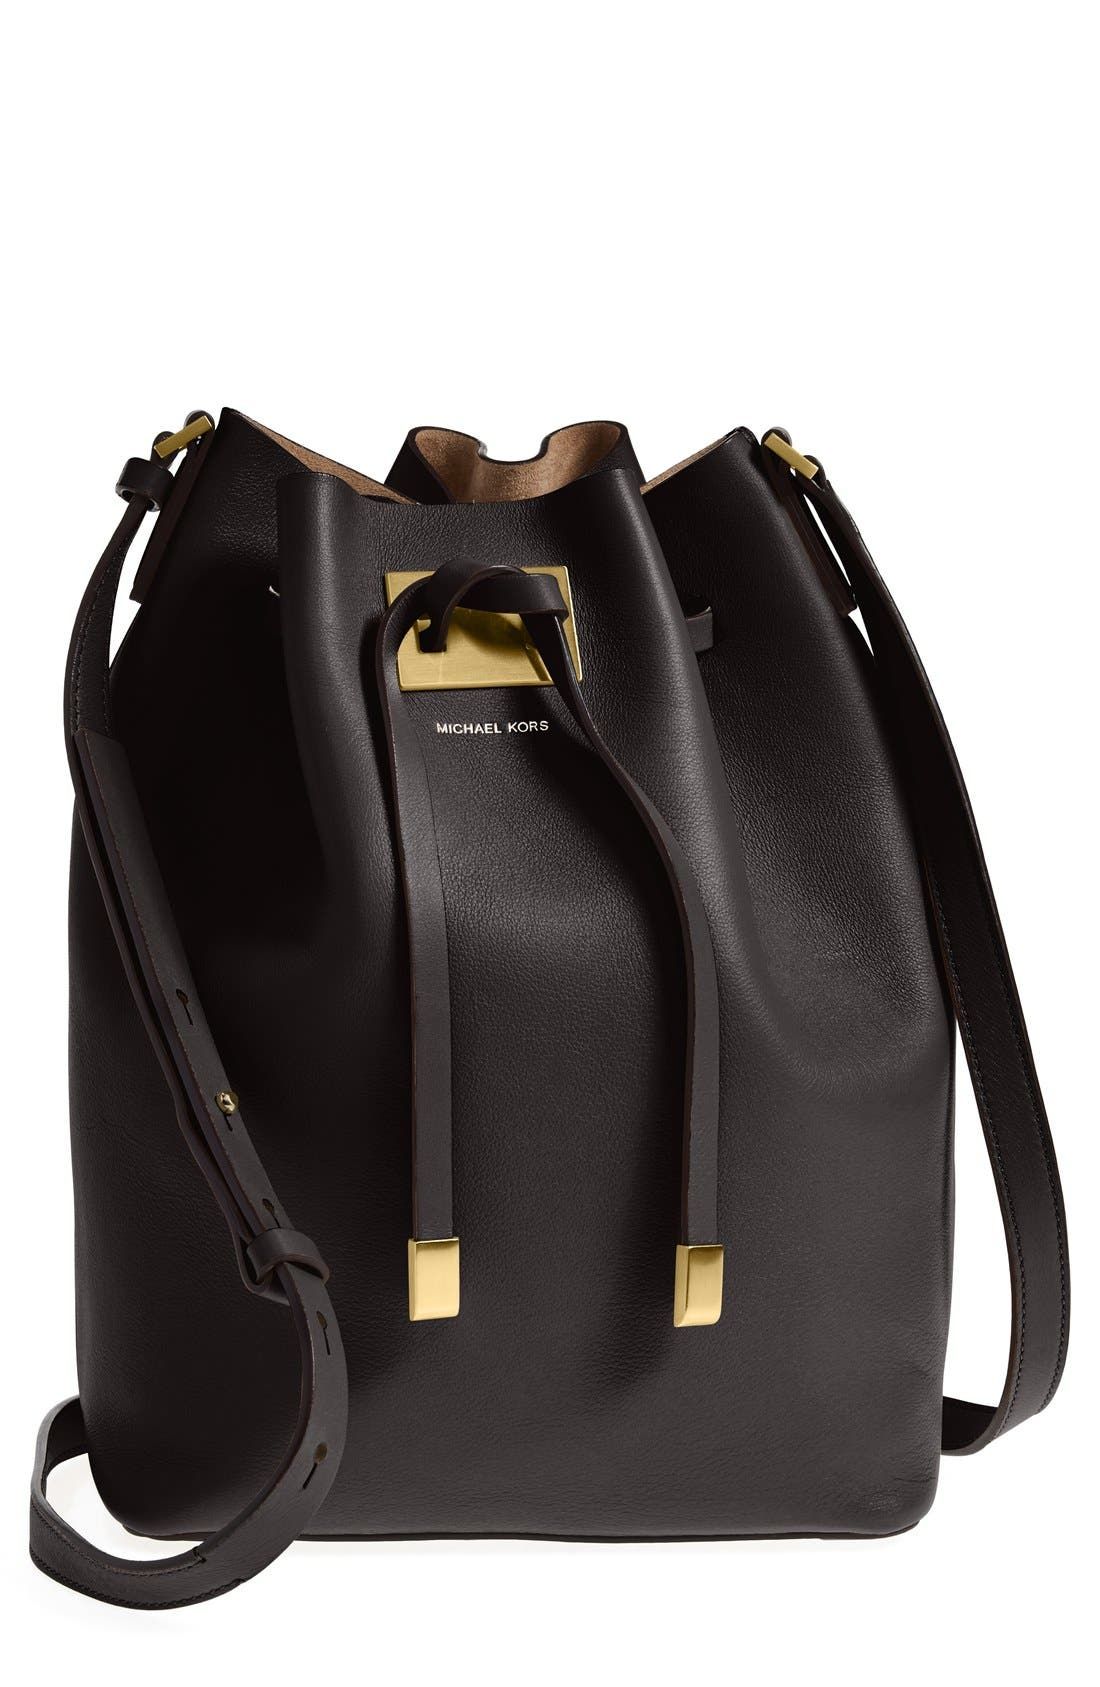 Alternate Image 1 Selected - Michael Kors 'Large Miranda' Leather Bucket Bag